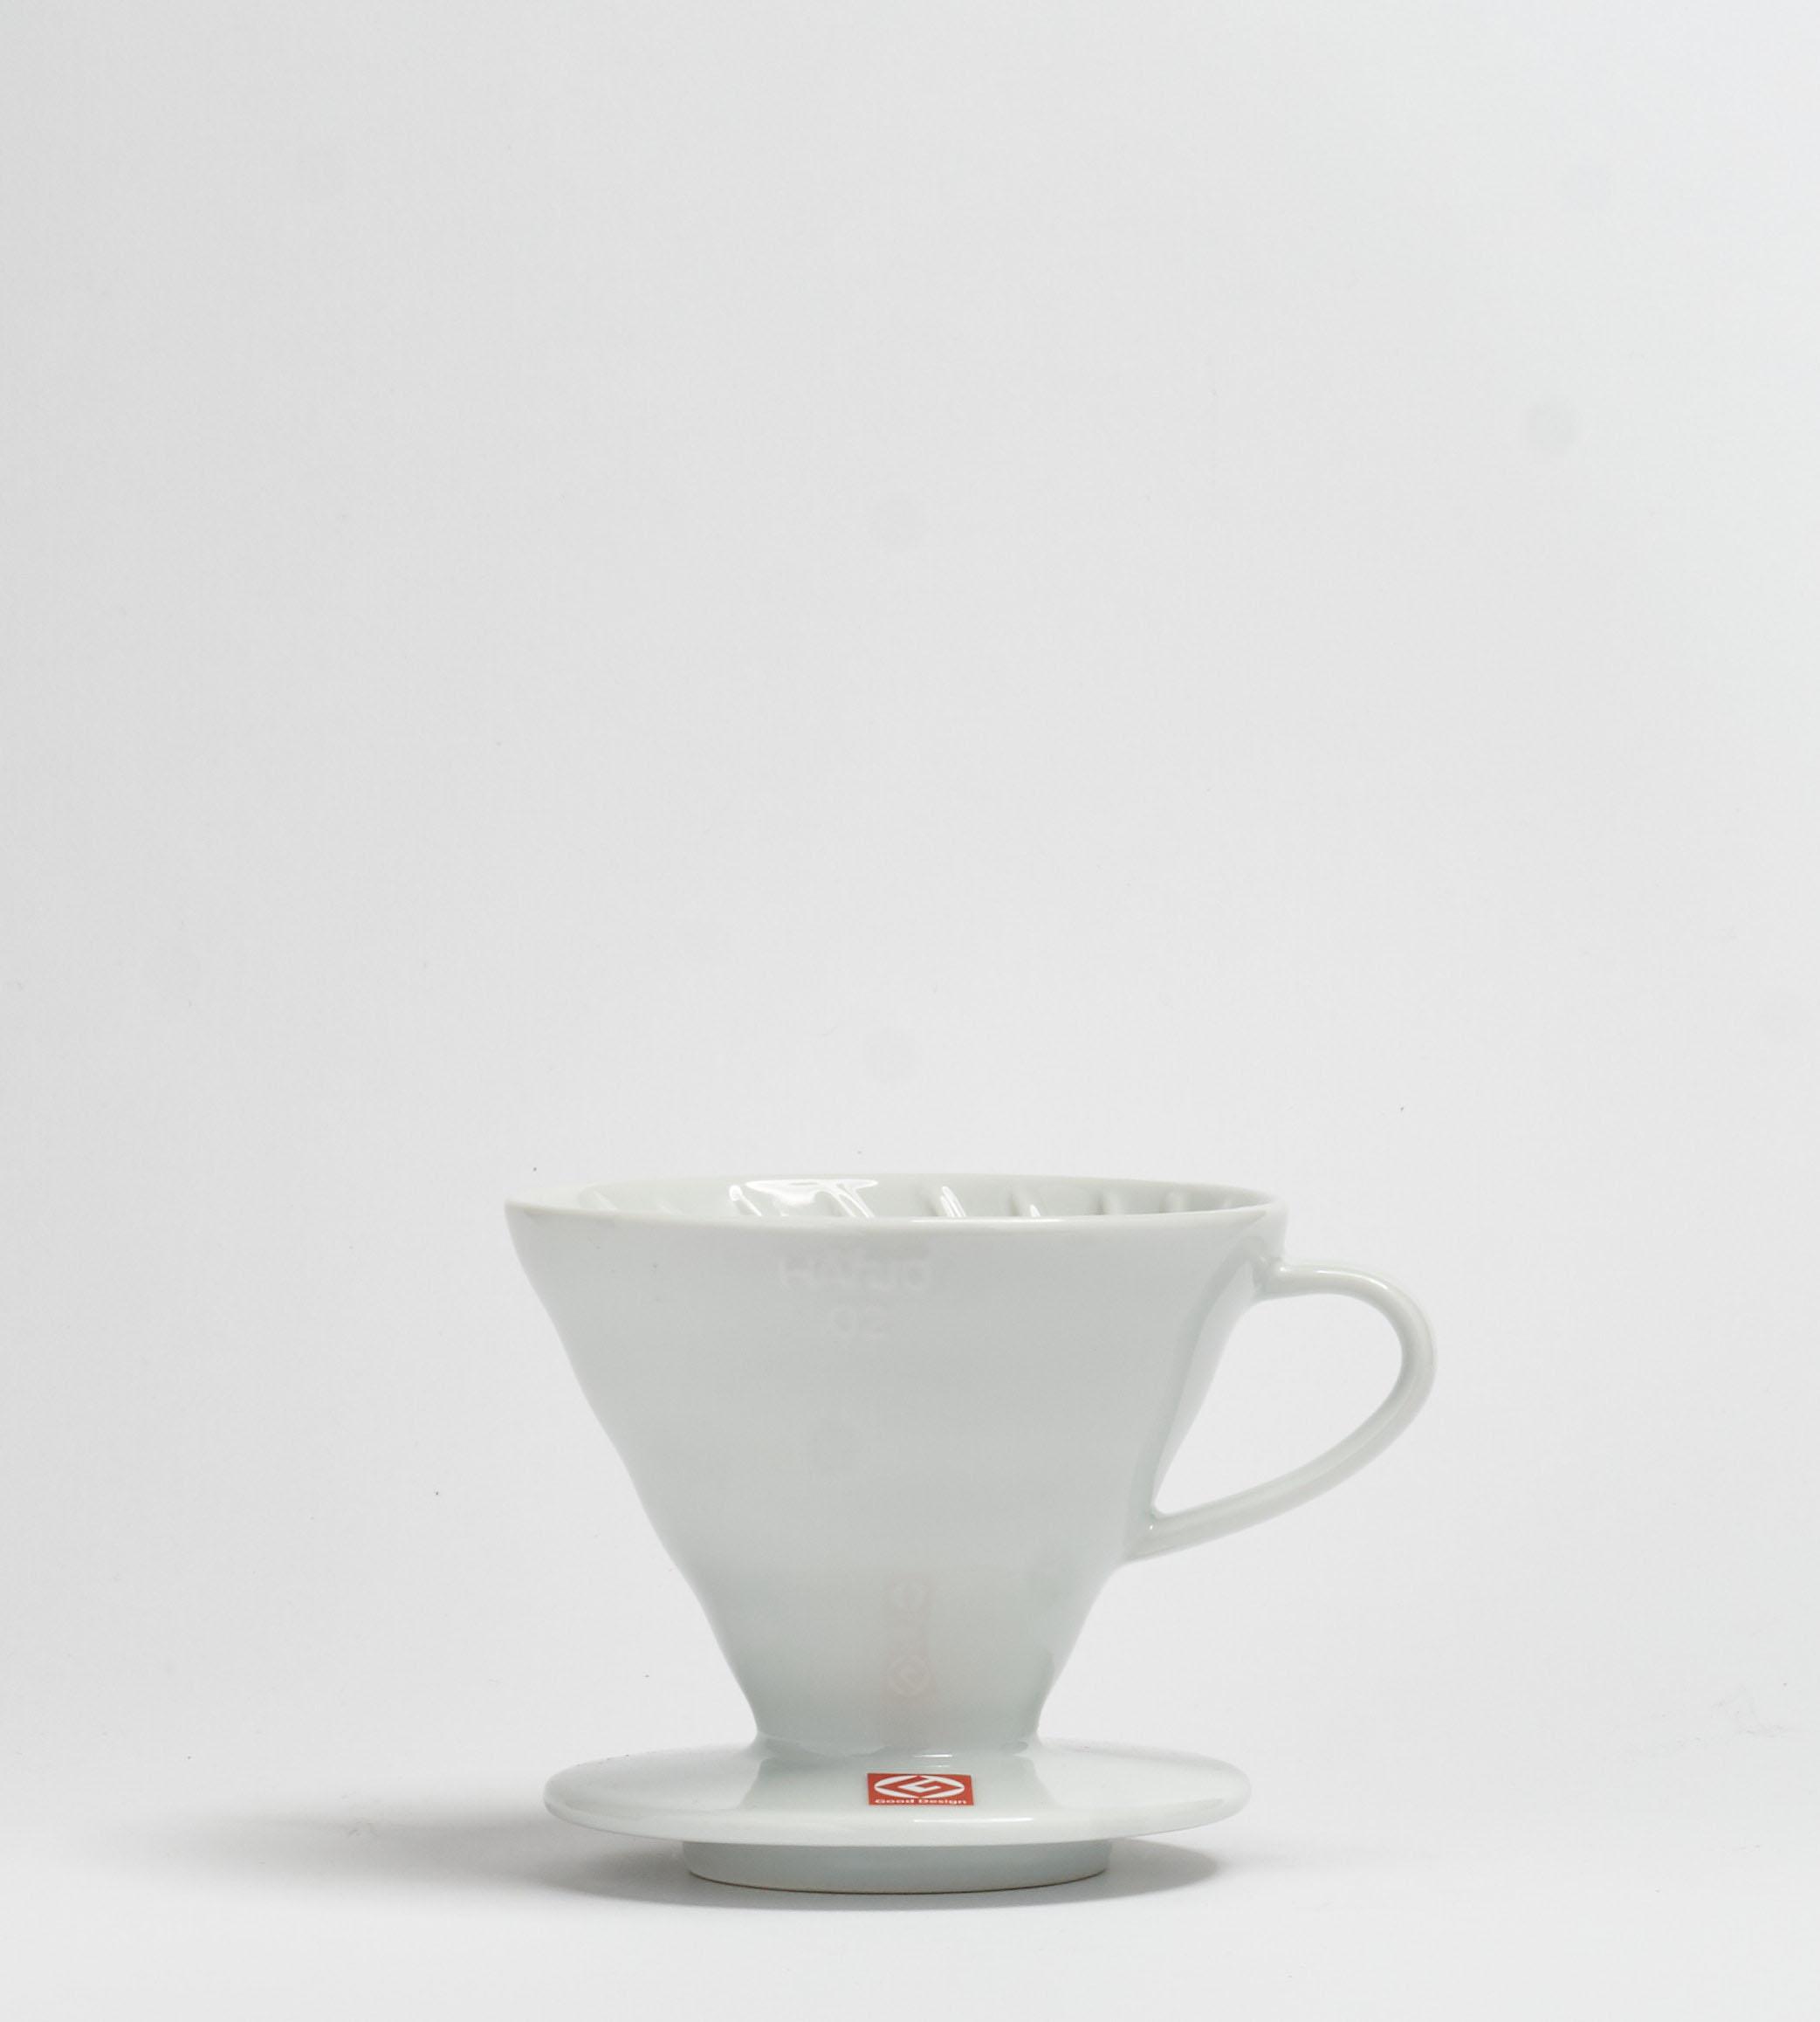 V60-02, Ceramic Dripper, white-prev-1